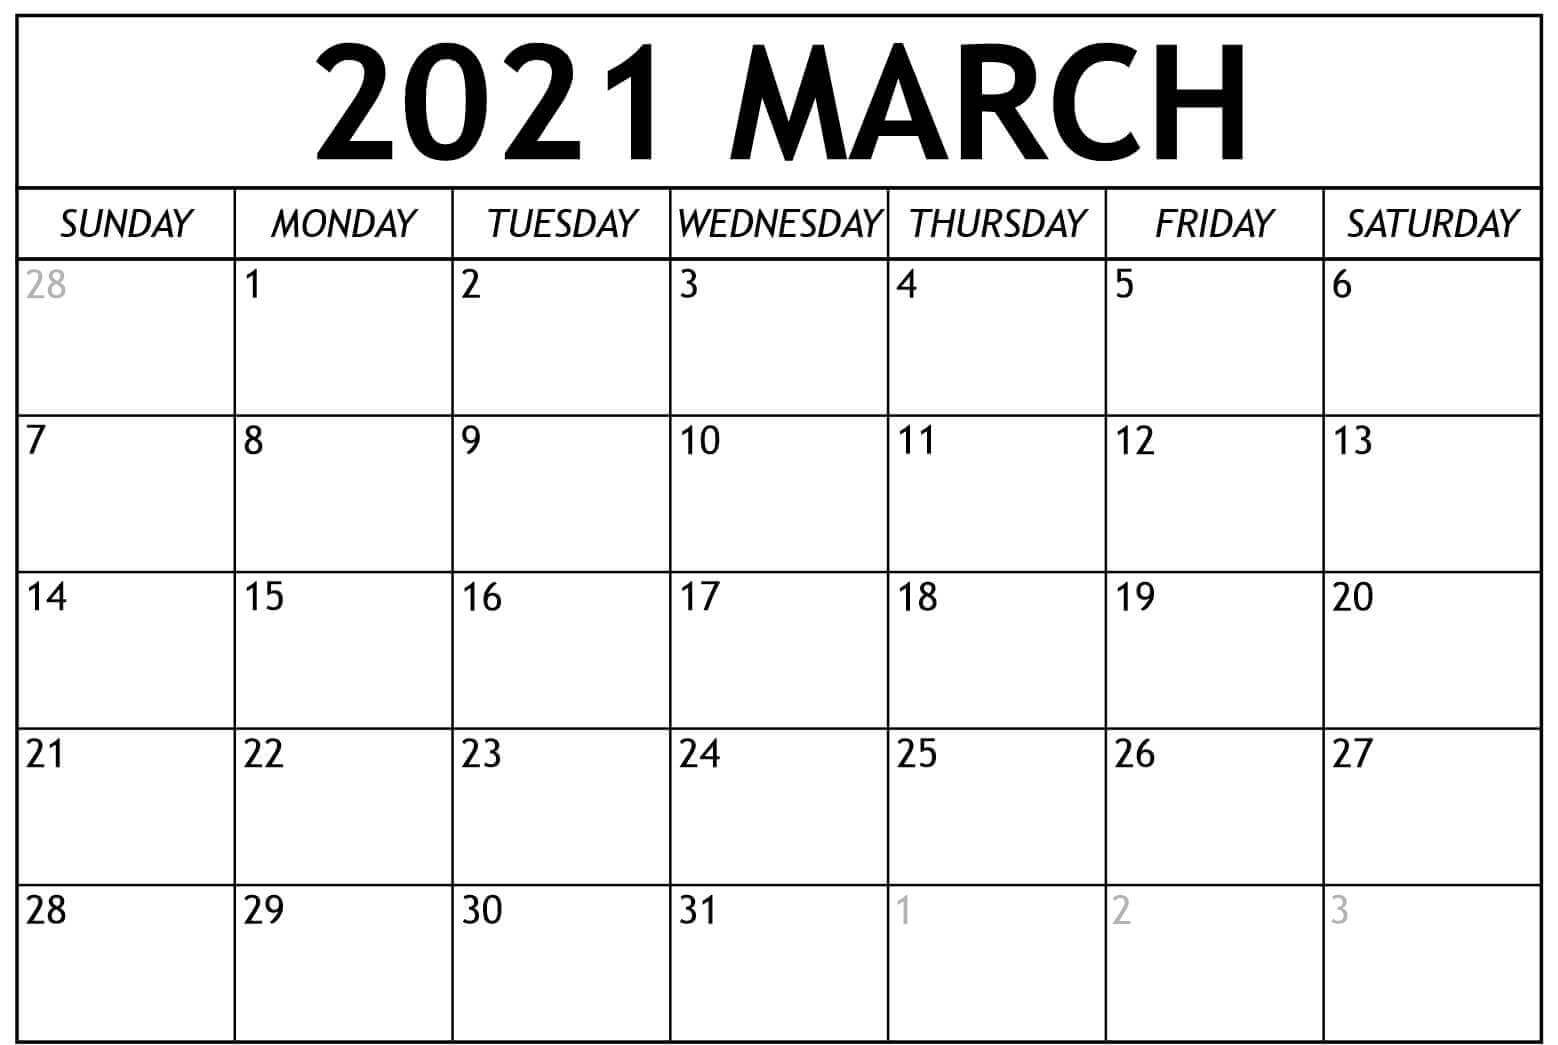 Blank March 2021 Printable Calendar